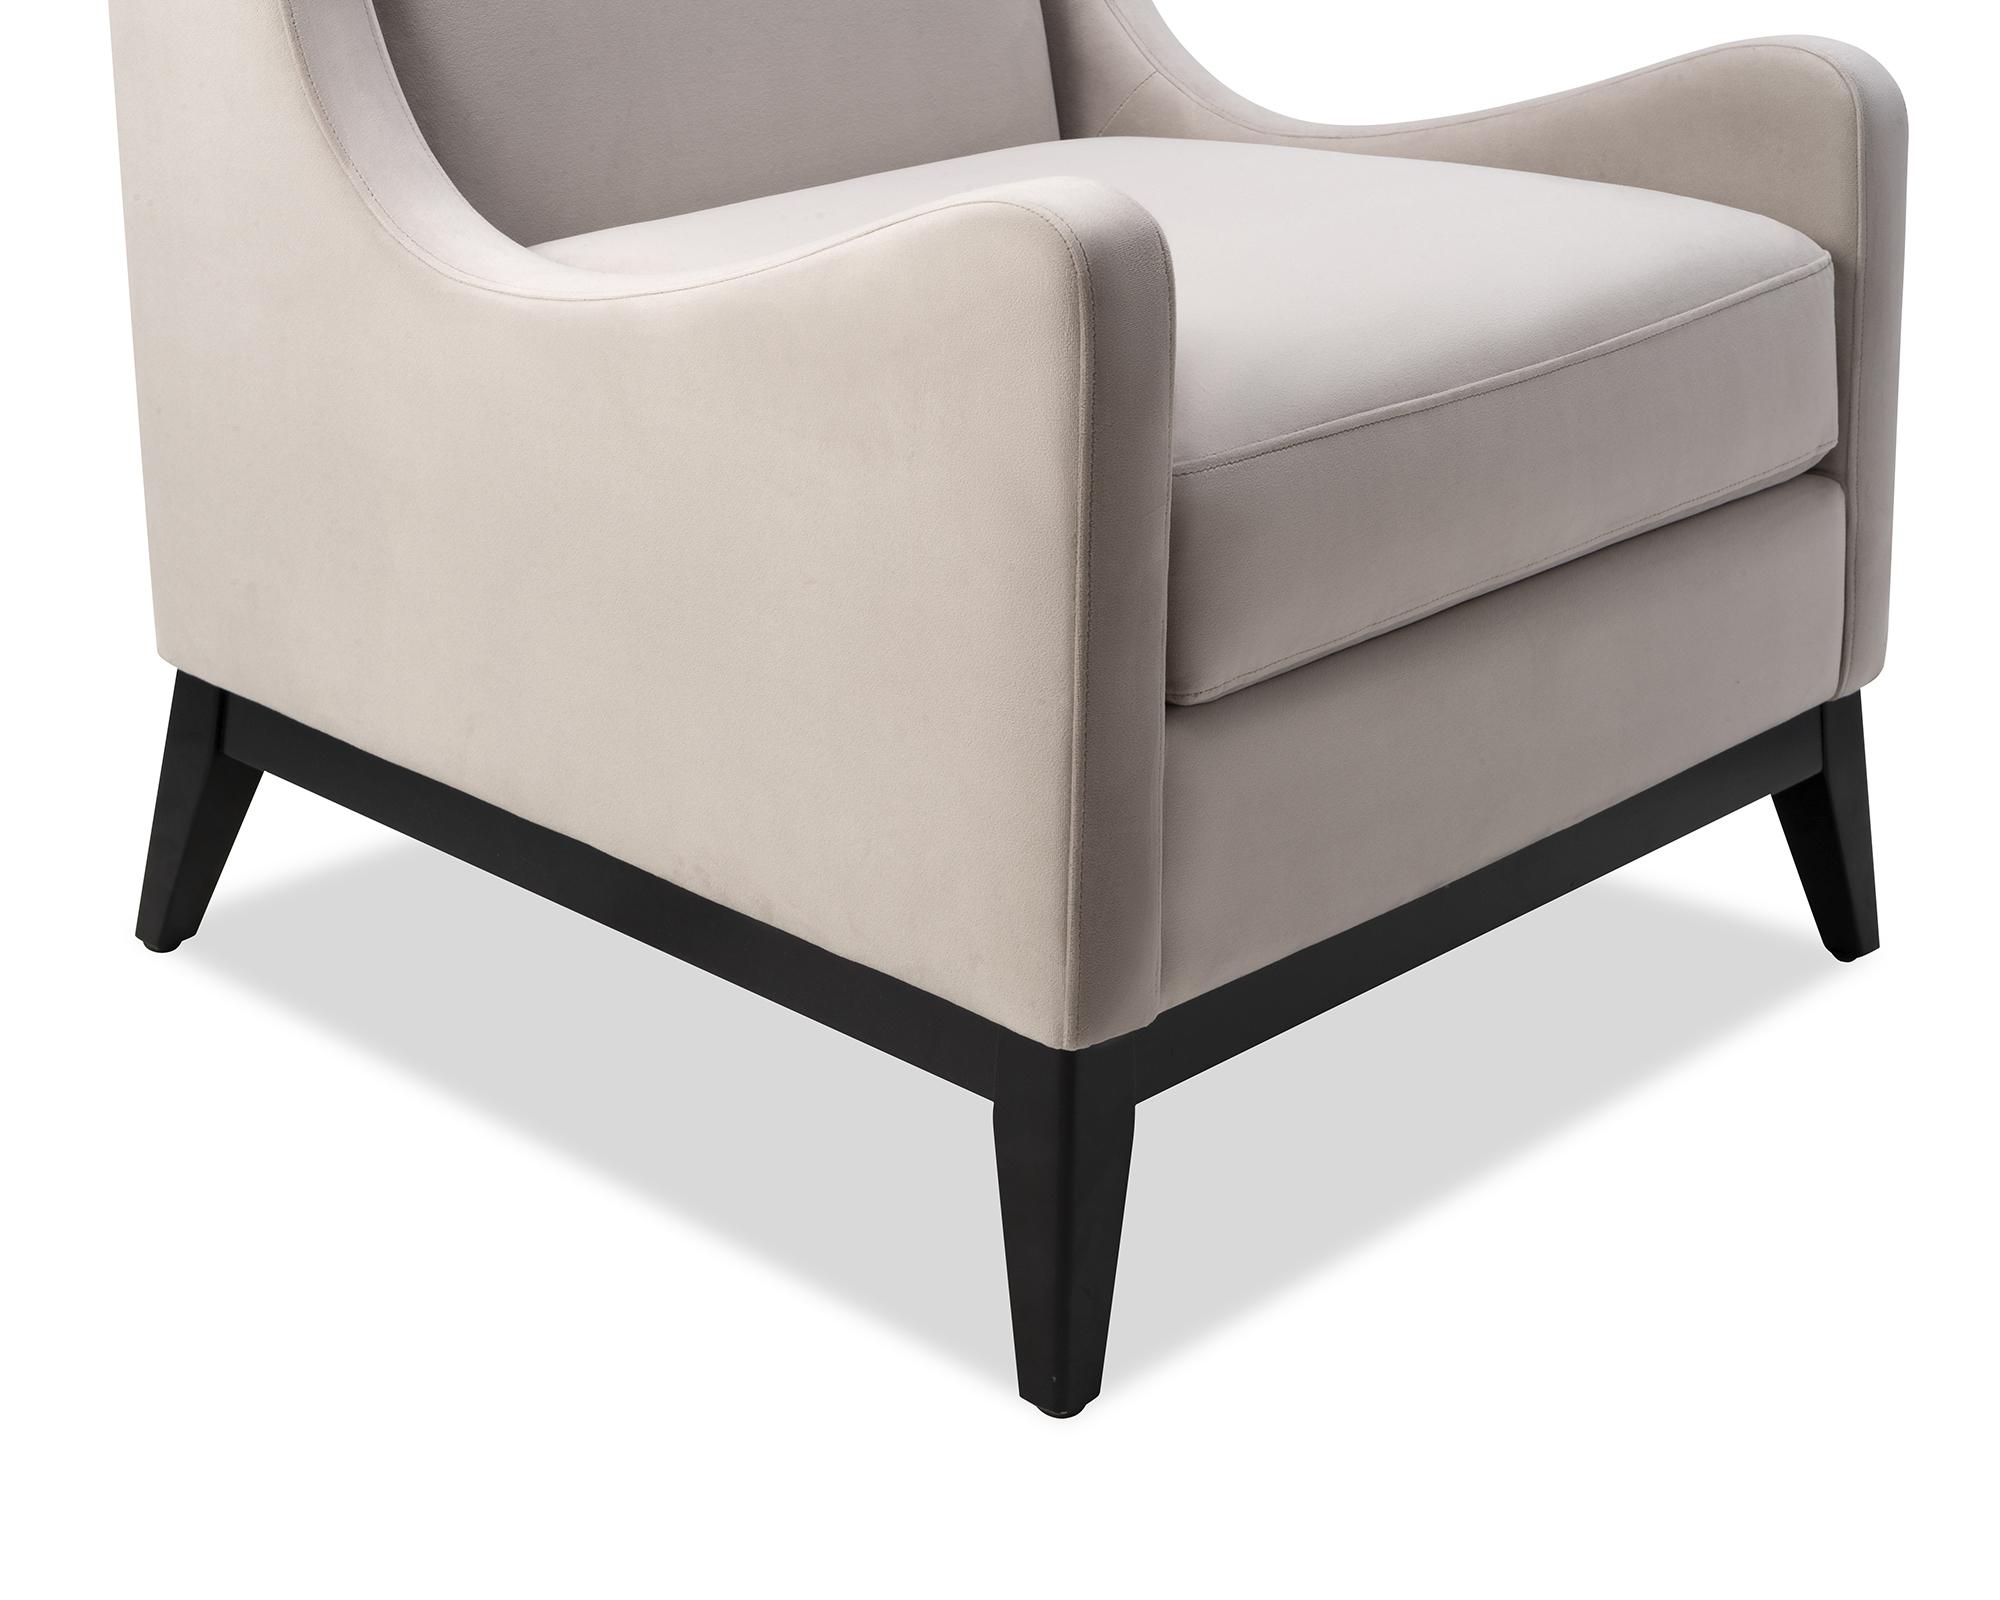 Liang & Eimil Lima Occasional Chair Limestone Velvet BH-OCH-089 (1)